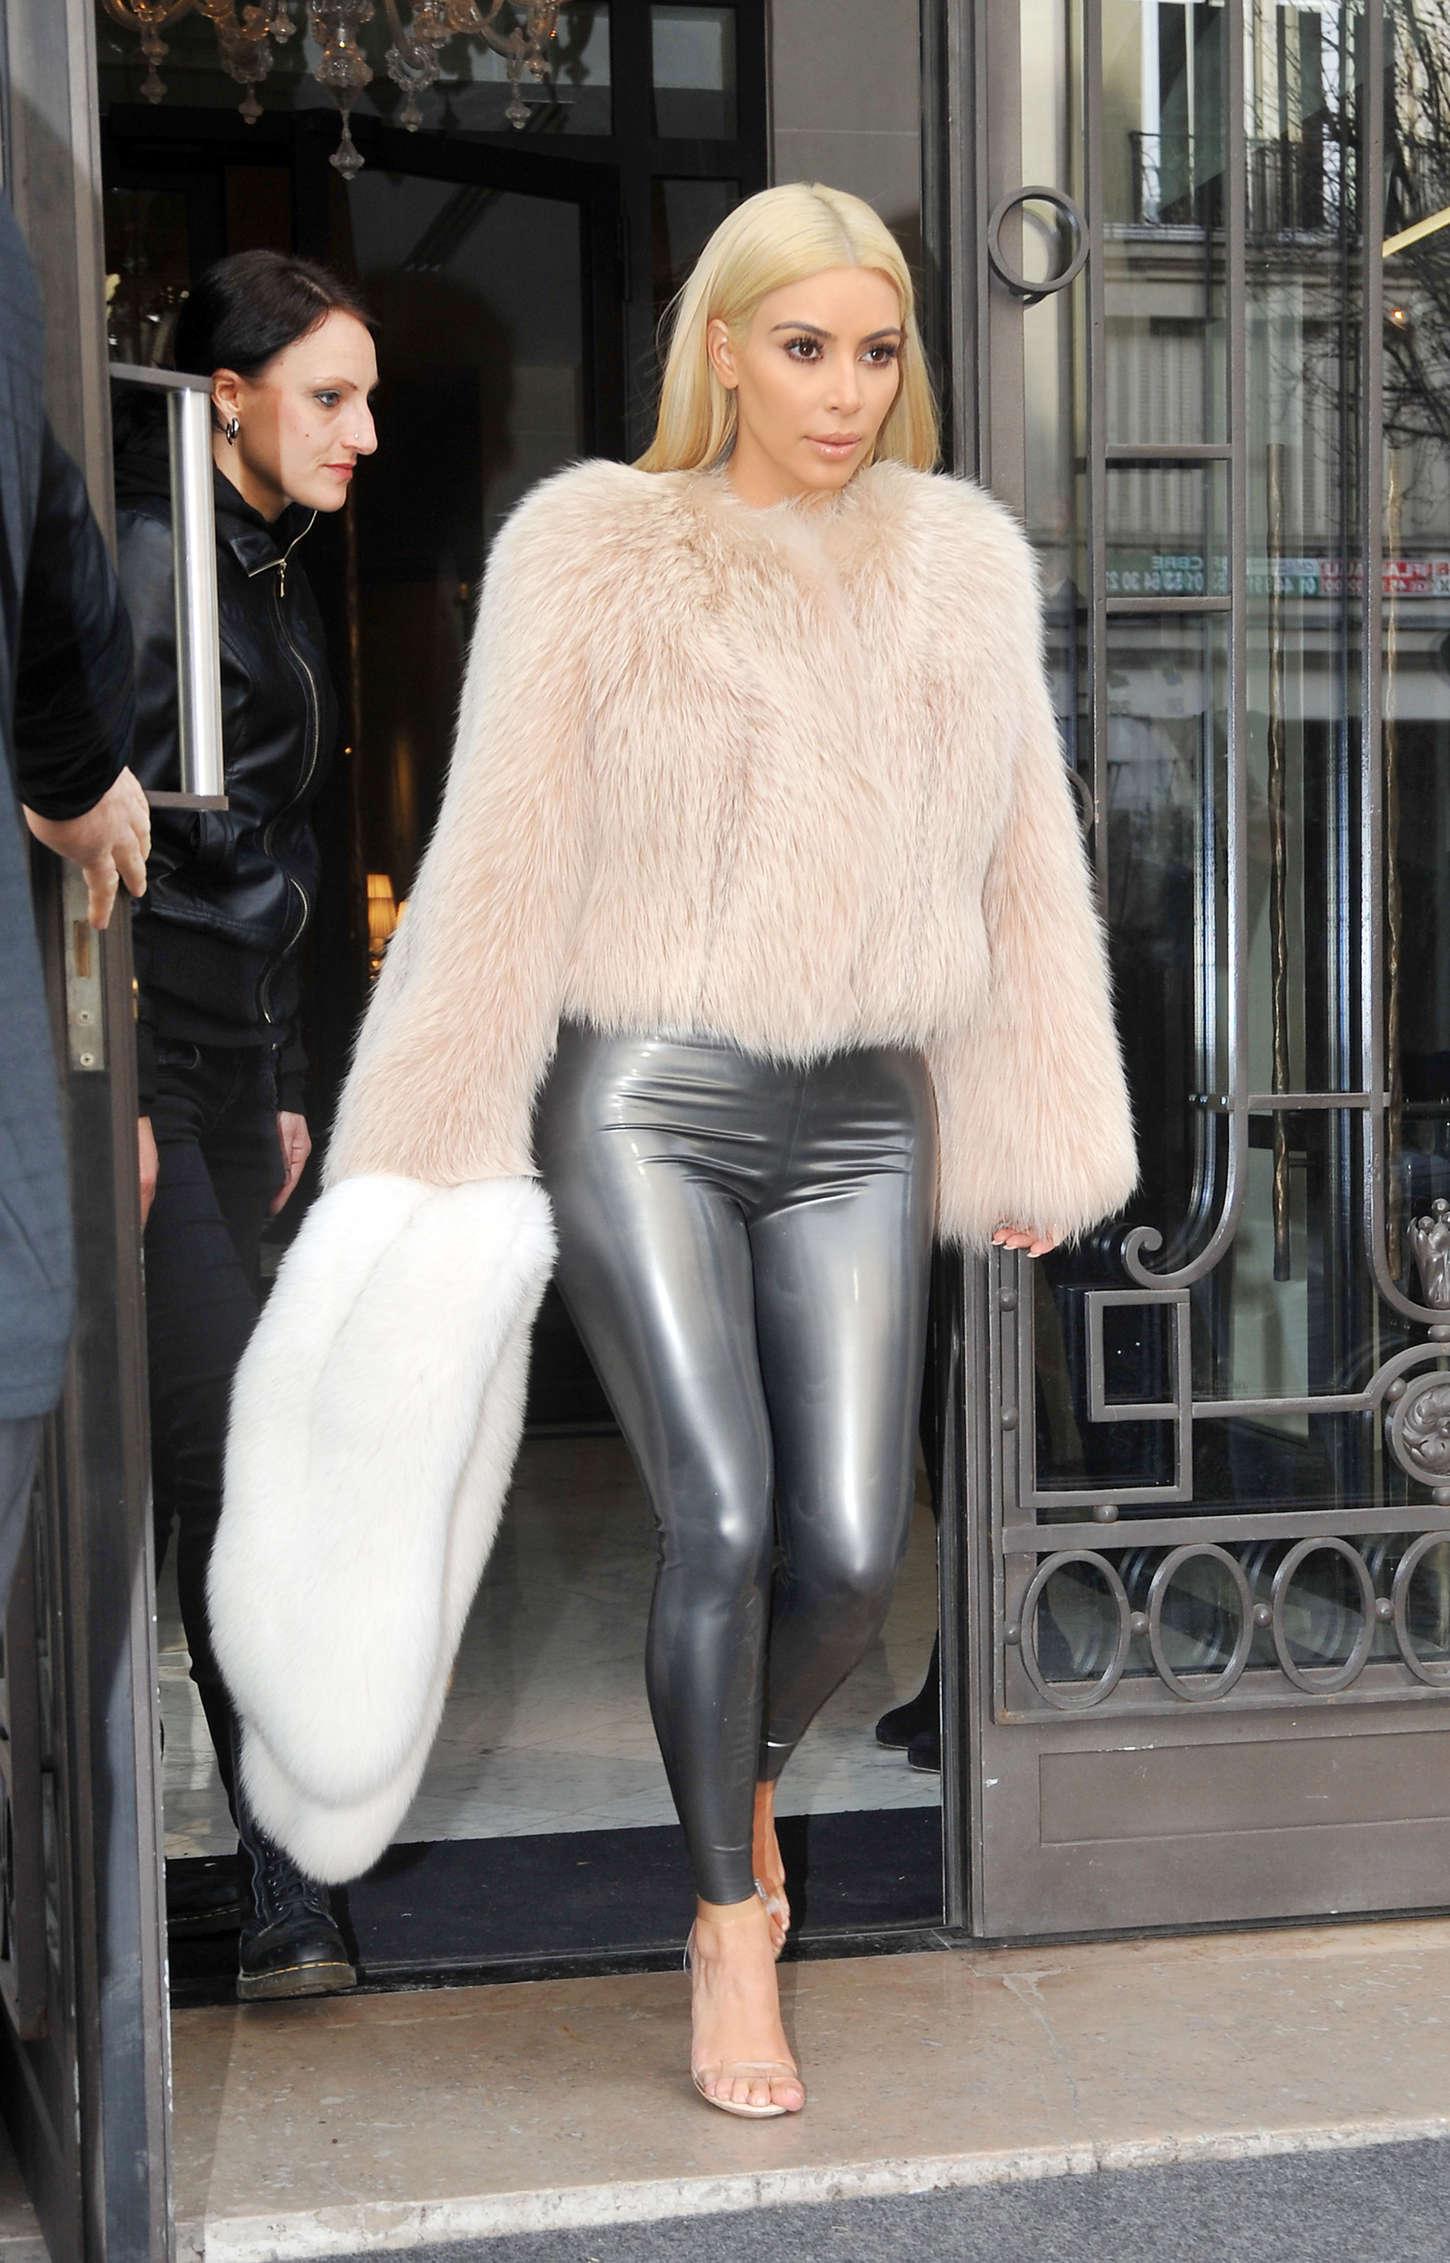 Kim Kardashian in Leather Pants Out in Paris